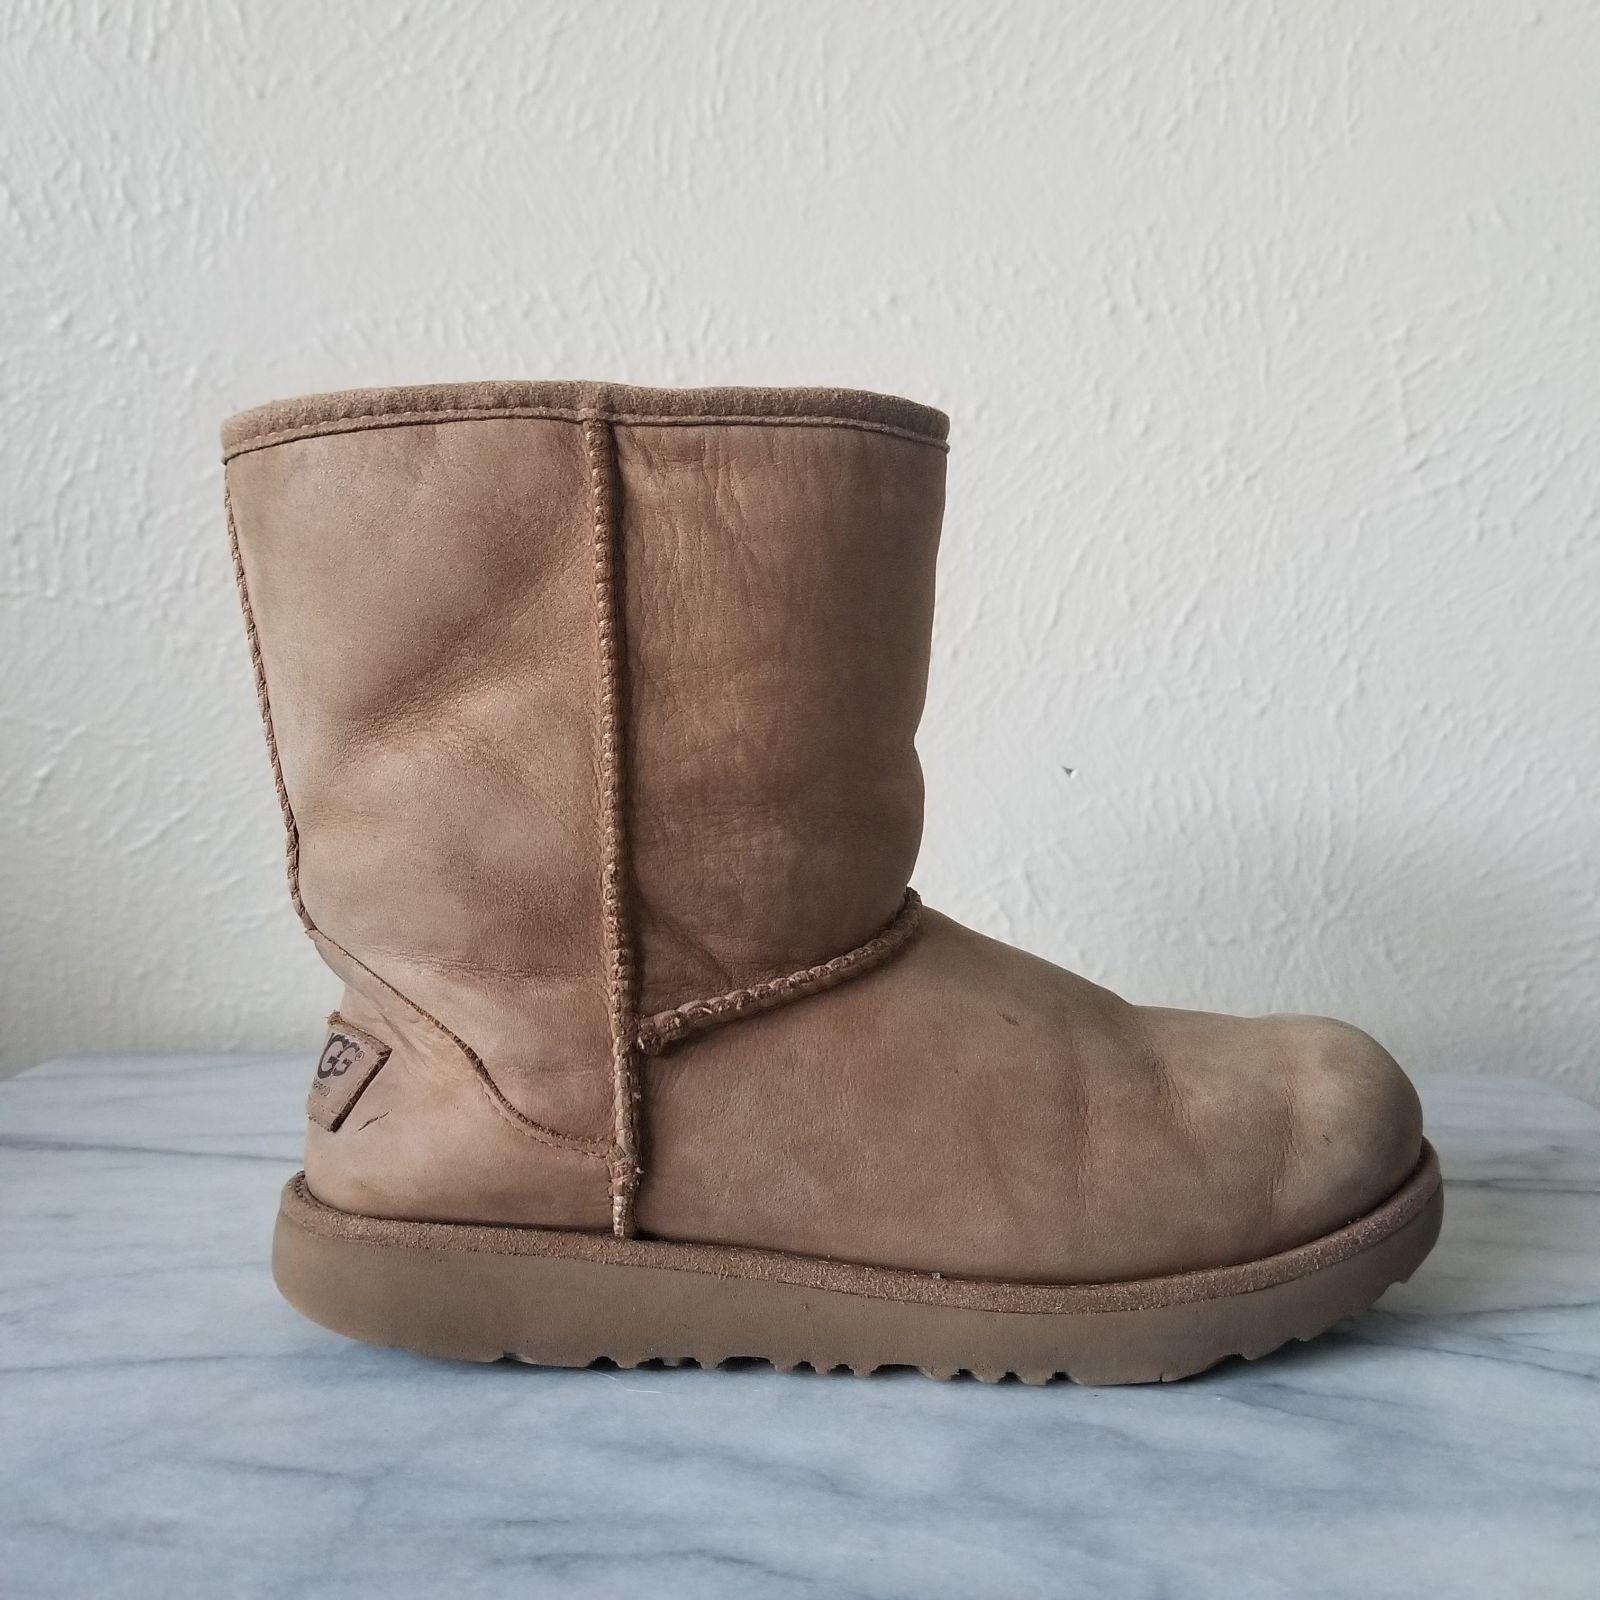 UGG Classic II Short Weather Boots 3